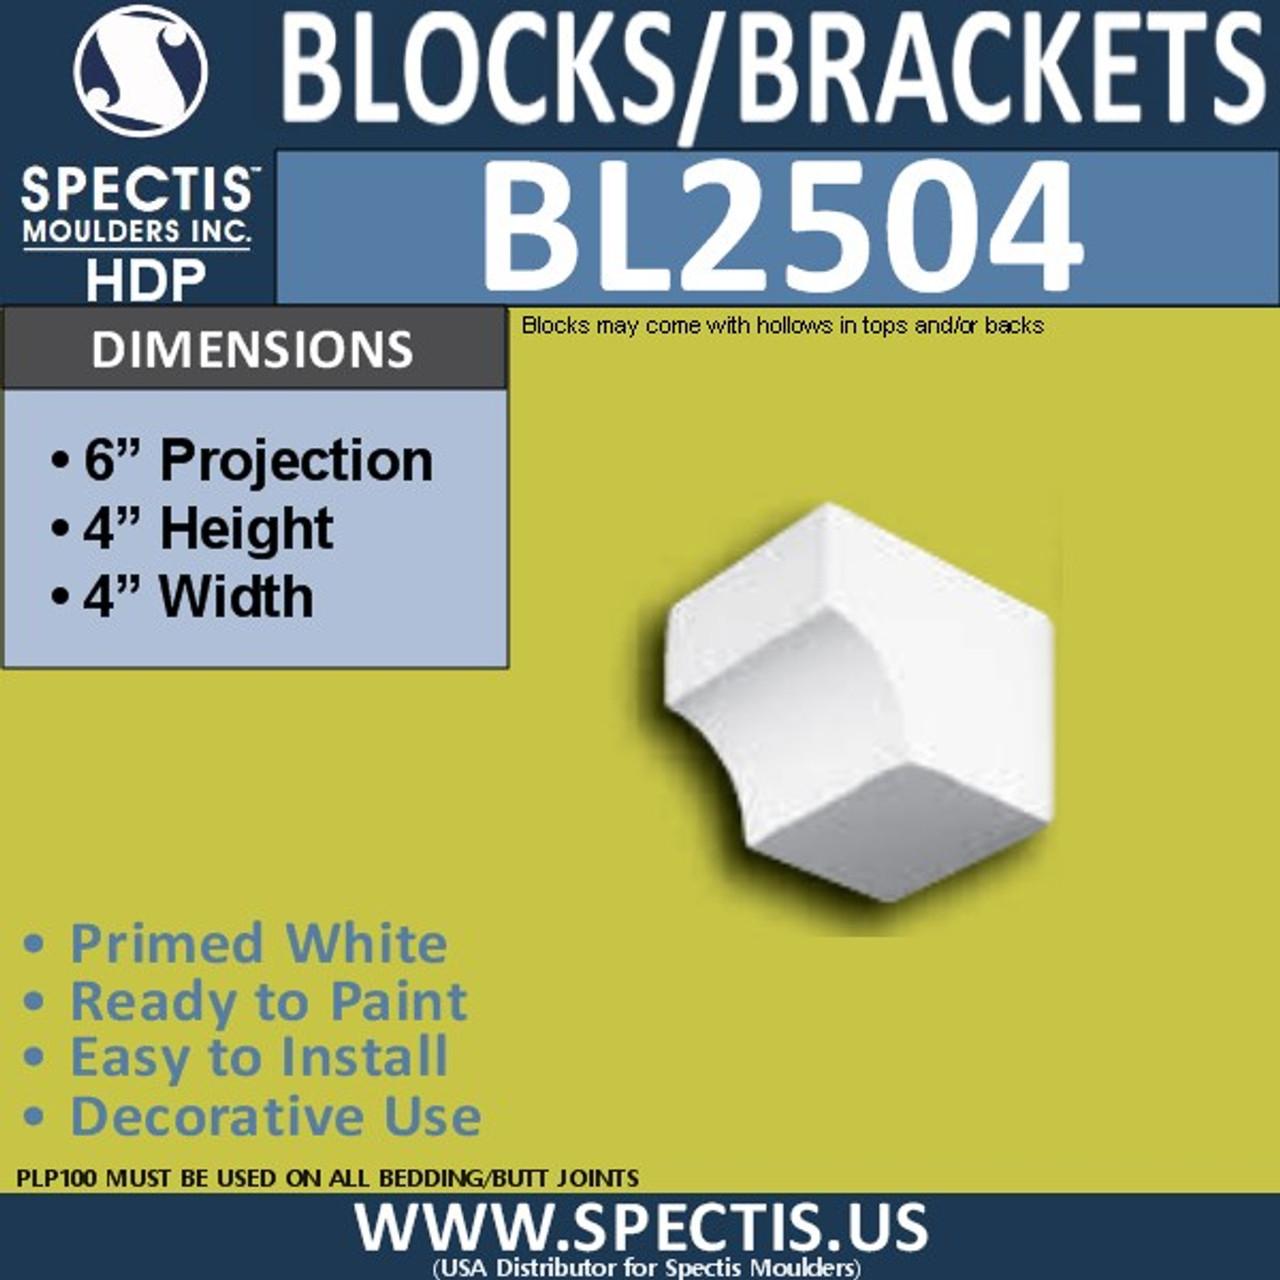 "BL2504 Eave Block or Bracket 4""W x 4""H x 6"" P"